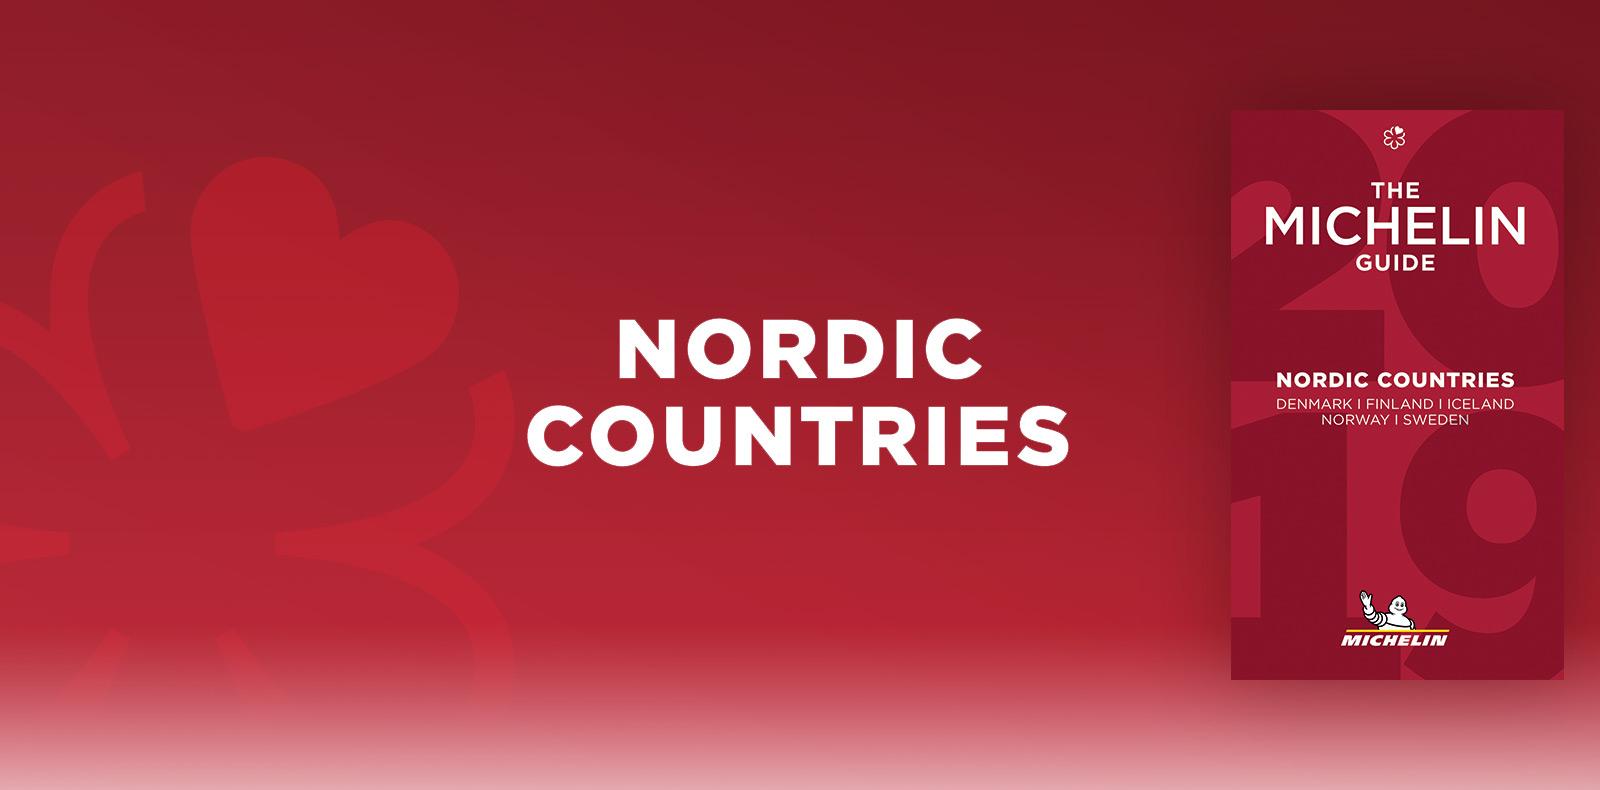 MICHELIN guide 2019 – Nordic Countries